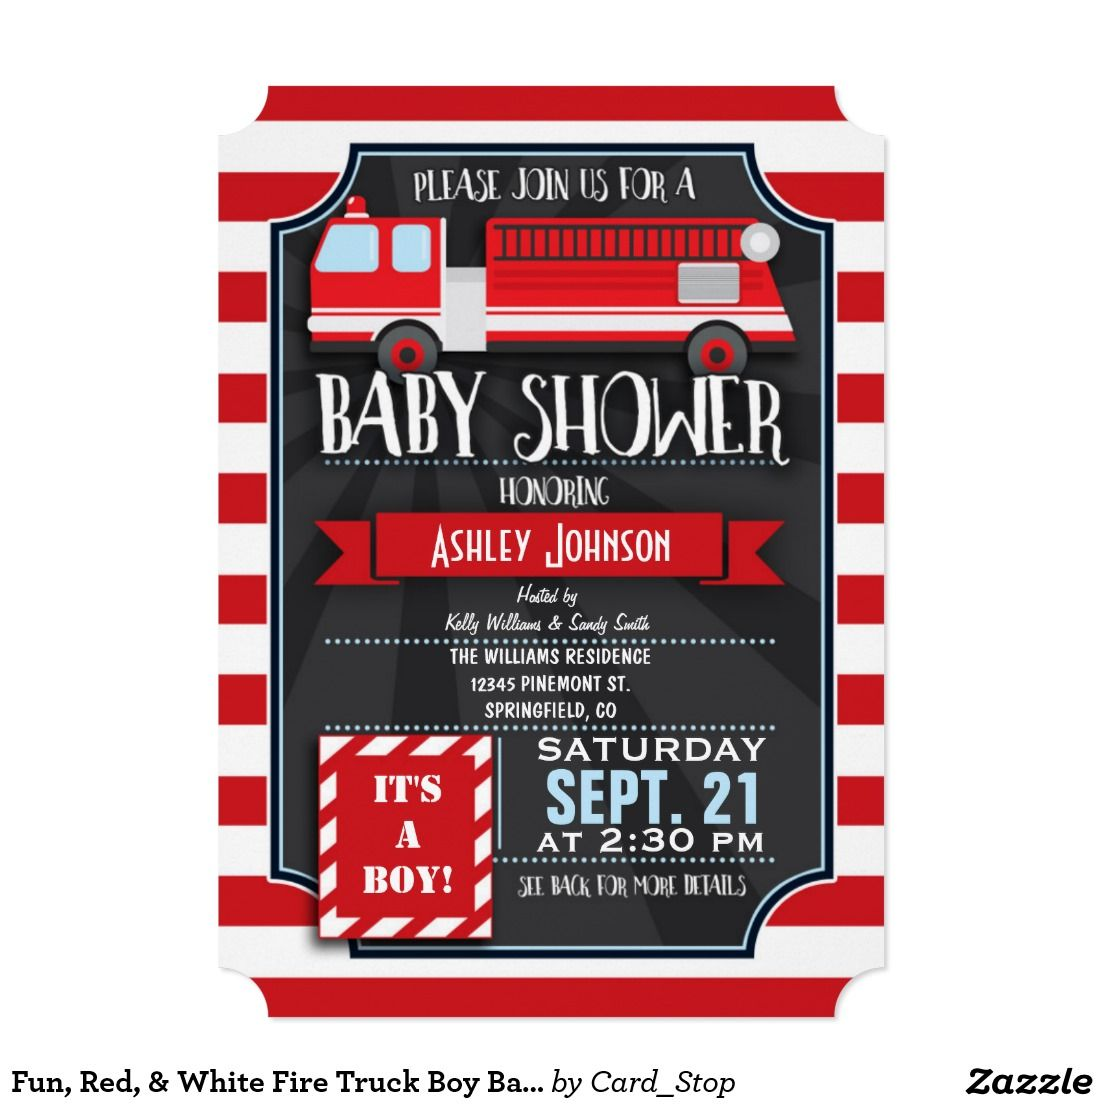 Fun, Red, & White Fire Truck Boy Baby Shower Card | Future Grands ...